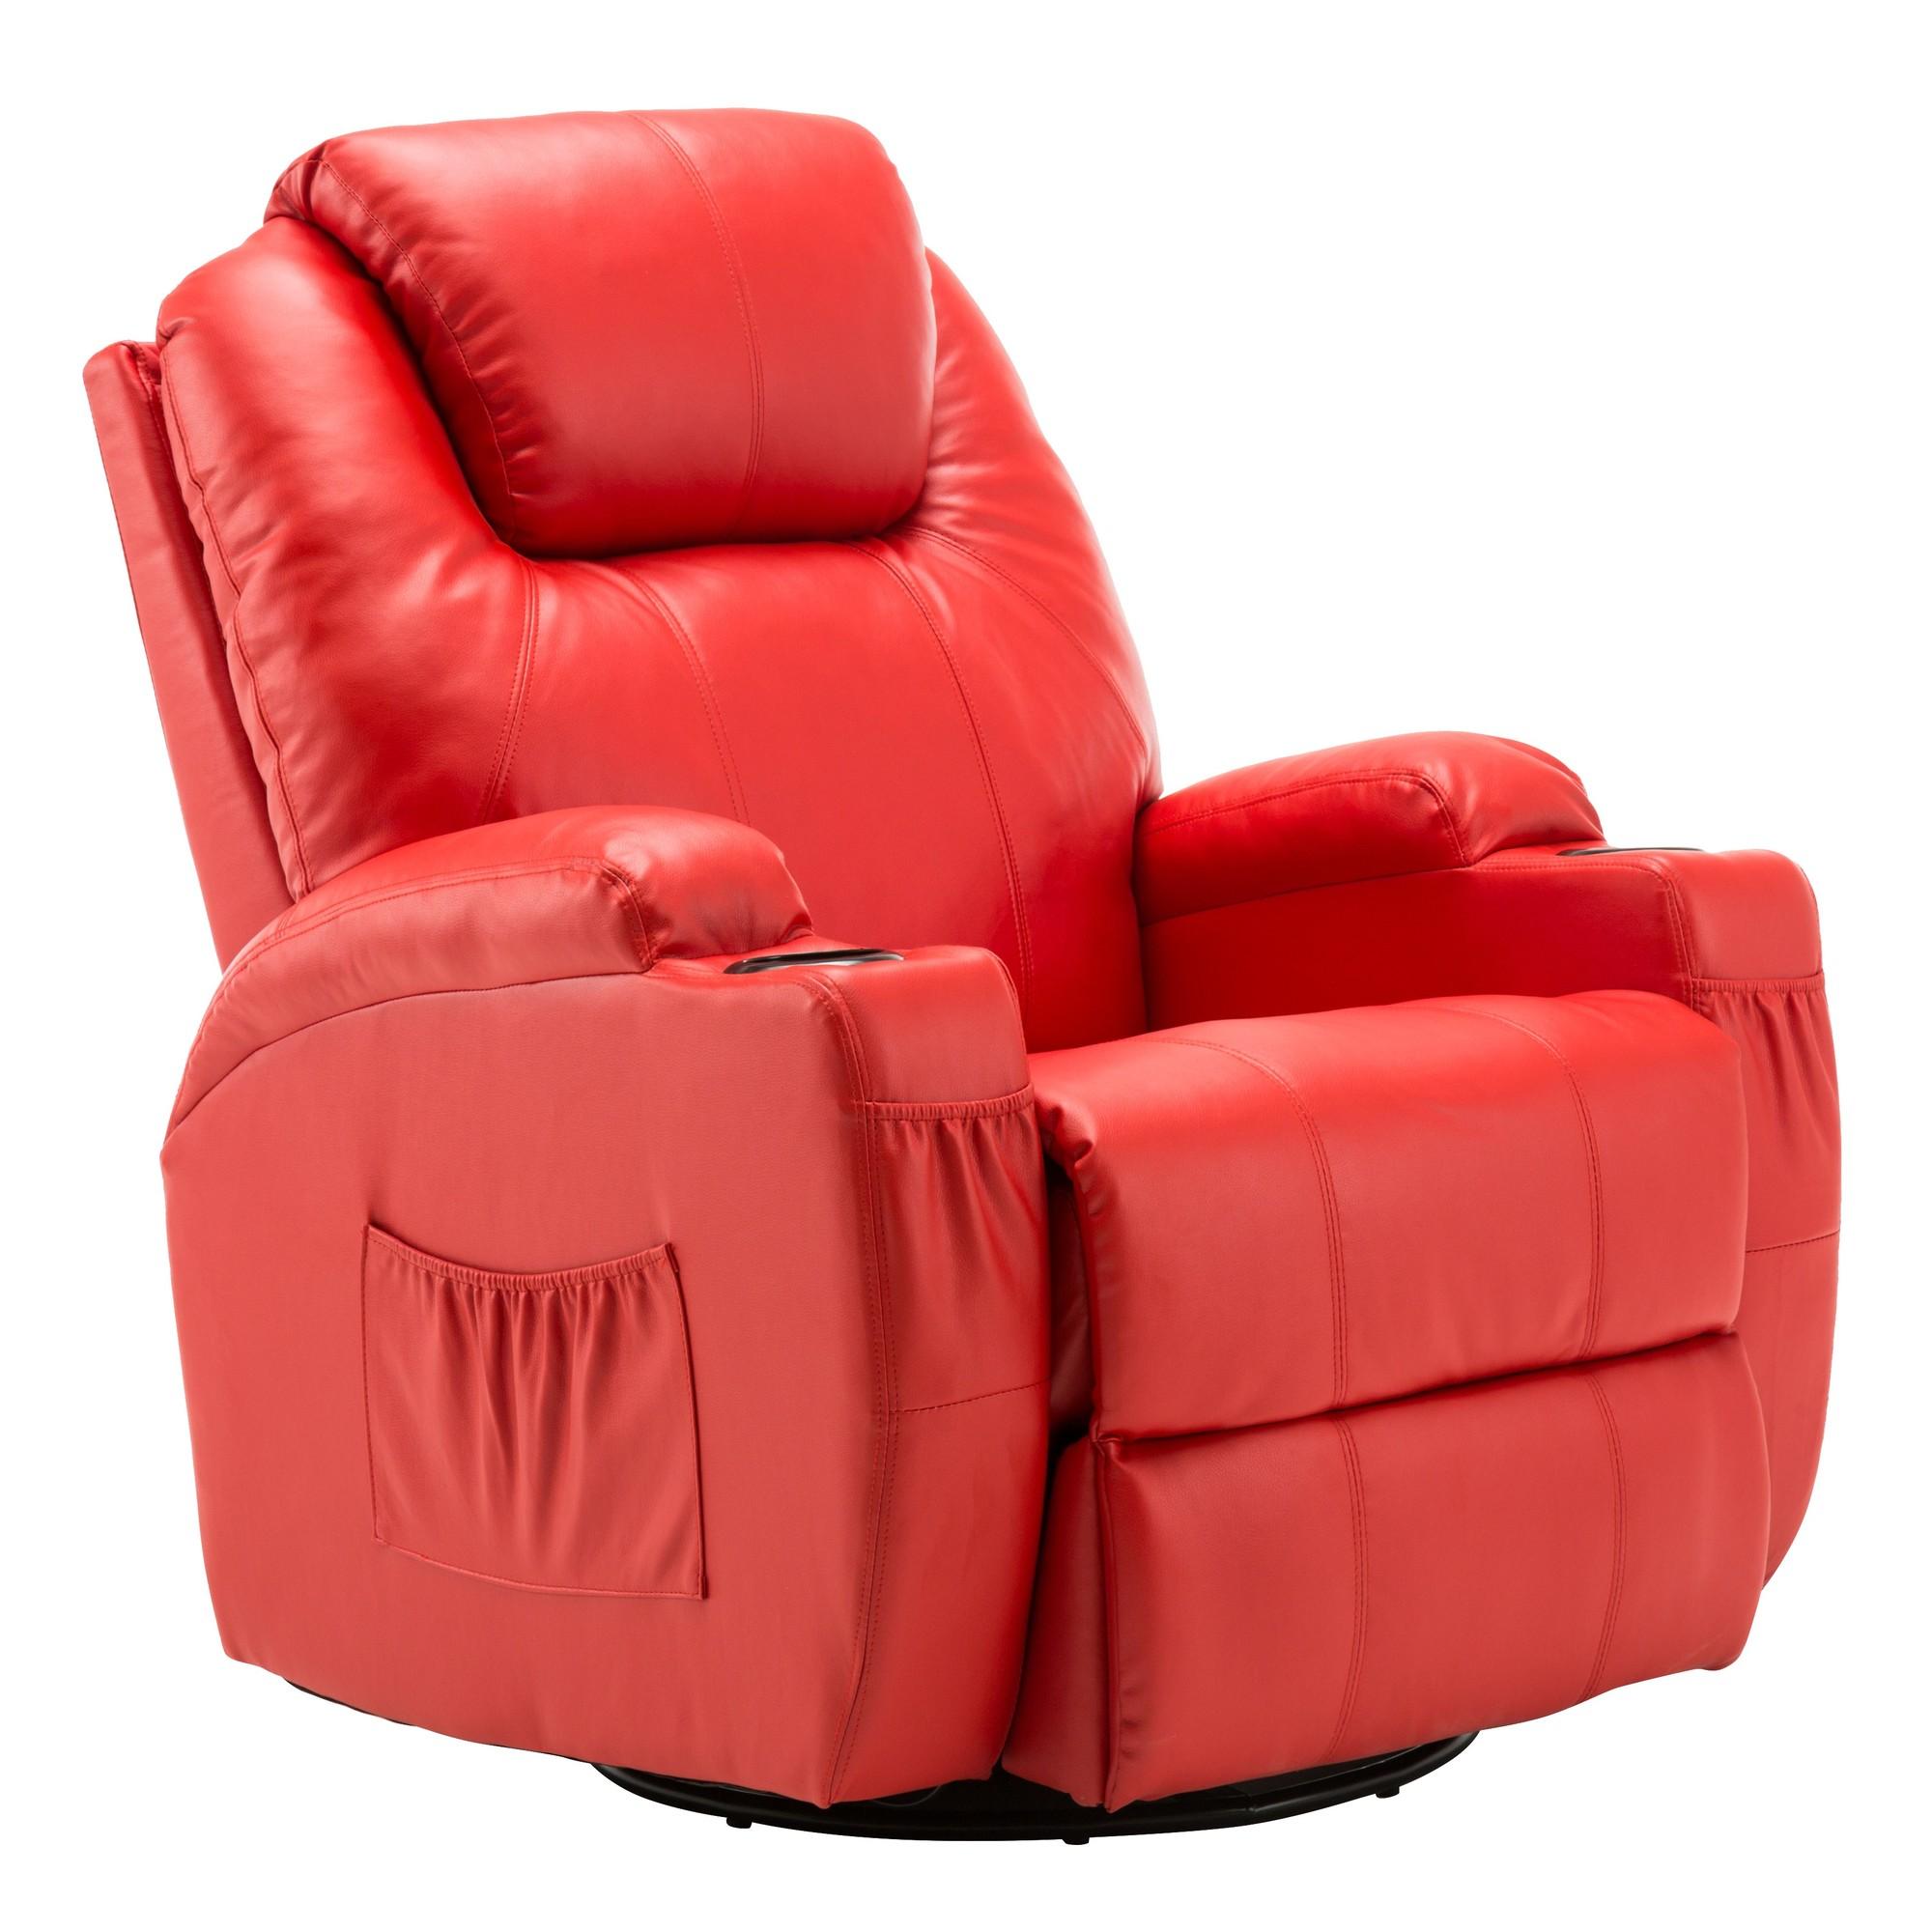 Mcombo Modern Massage Recliner Chair Vibrating Sofa Heated Pu